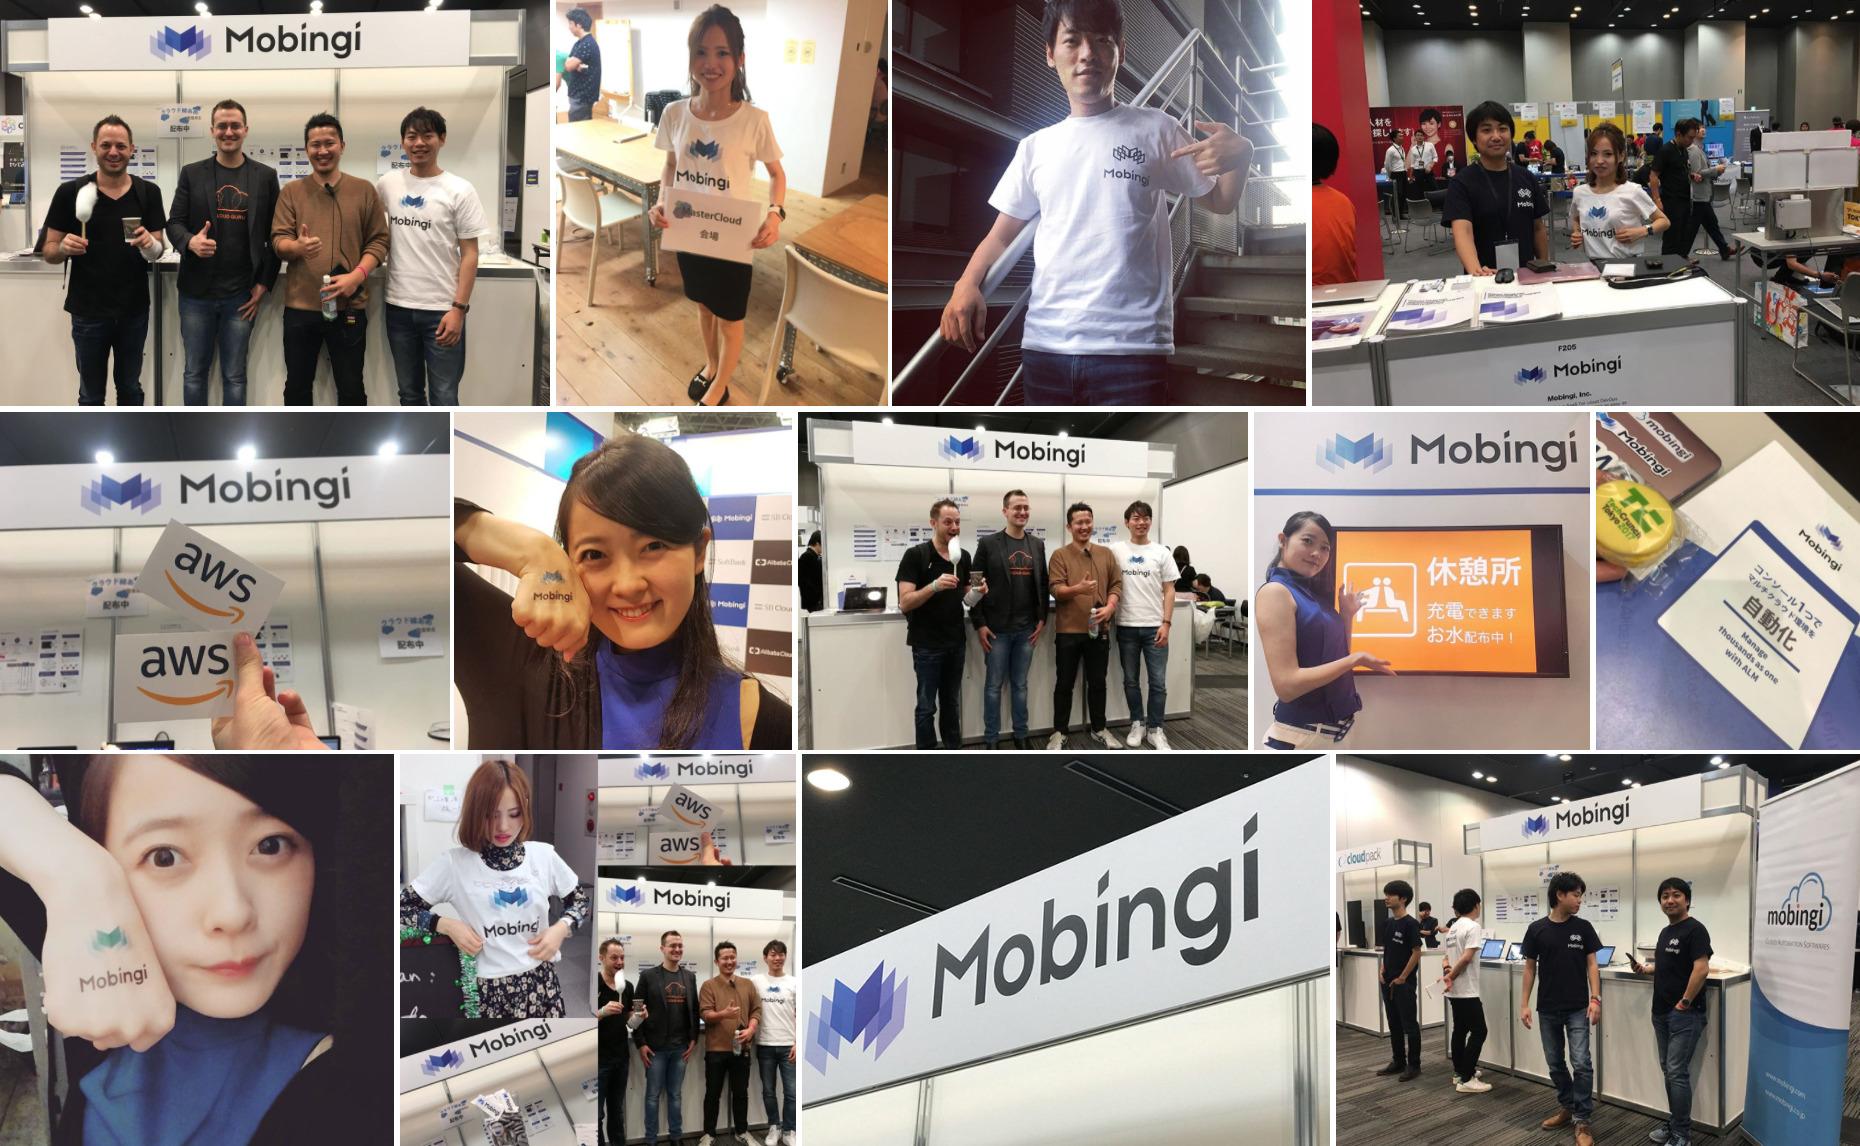 mobingi brand in real life